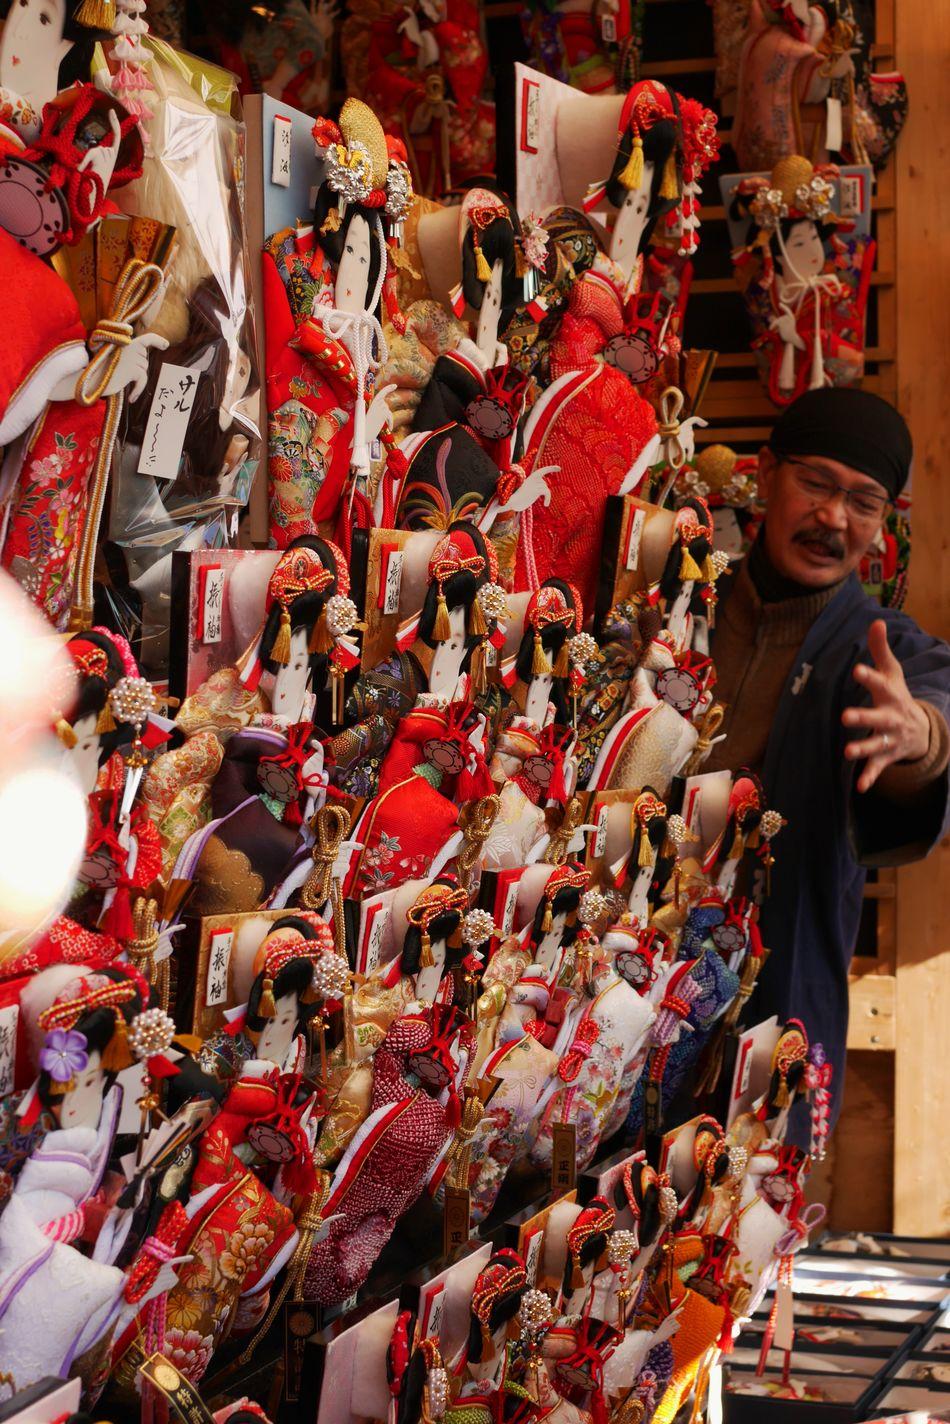 Battledore fair/羽子板市 お店によって絵の表情が微細に異なっているのが楽しいです Battledore Fair Traditional Hanging Out Enjoying Life Japan Style I Heart Tokyo My Winter Favorites LUMIX DMC-GX7